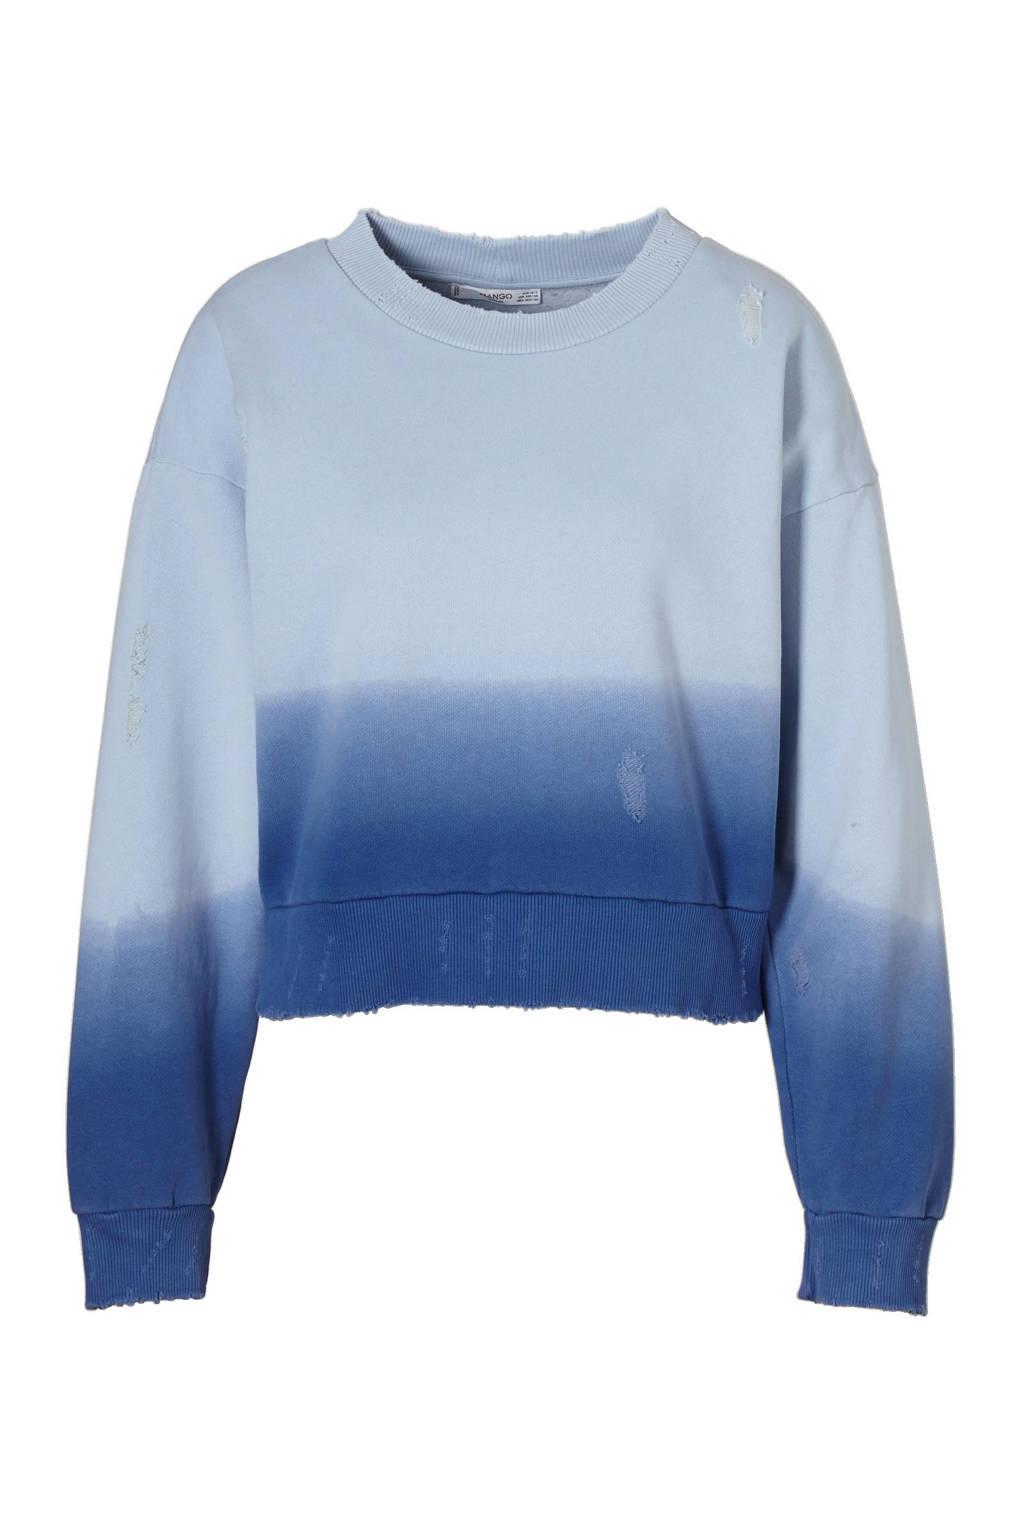 Mango sweater met tie-dye print, Blauw